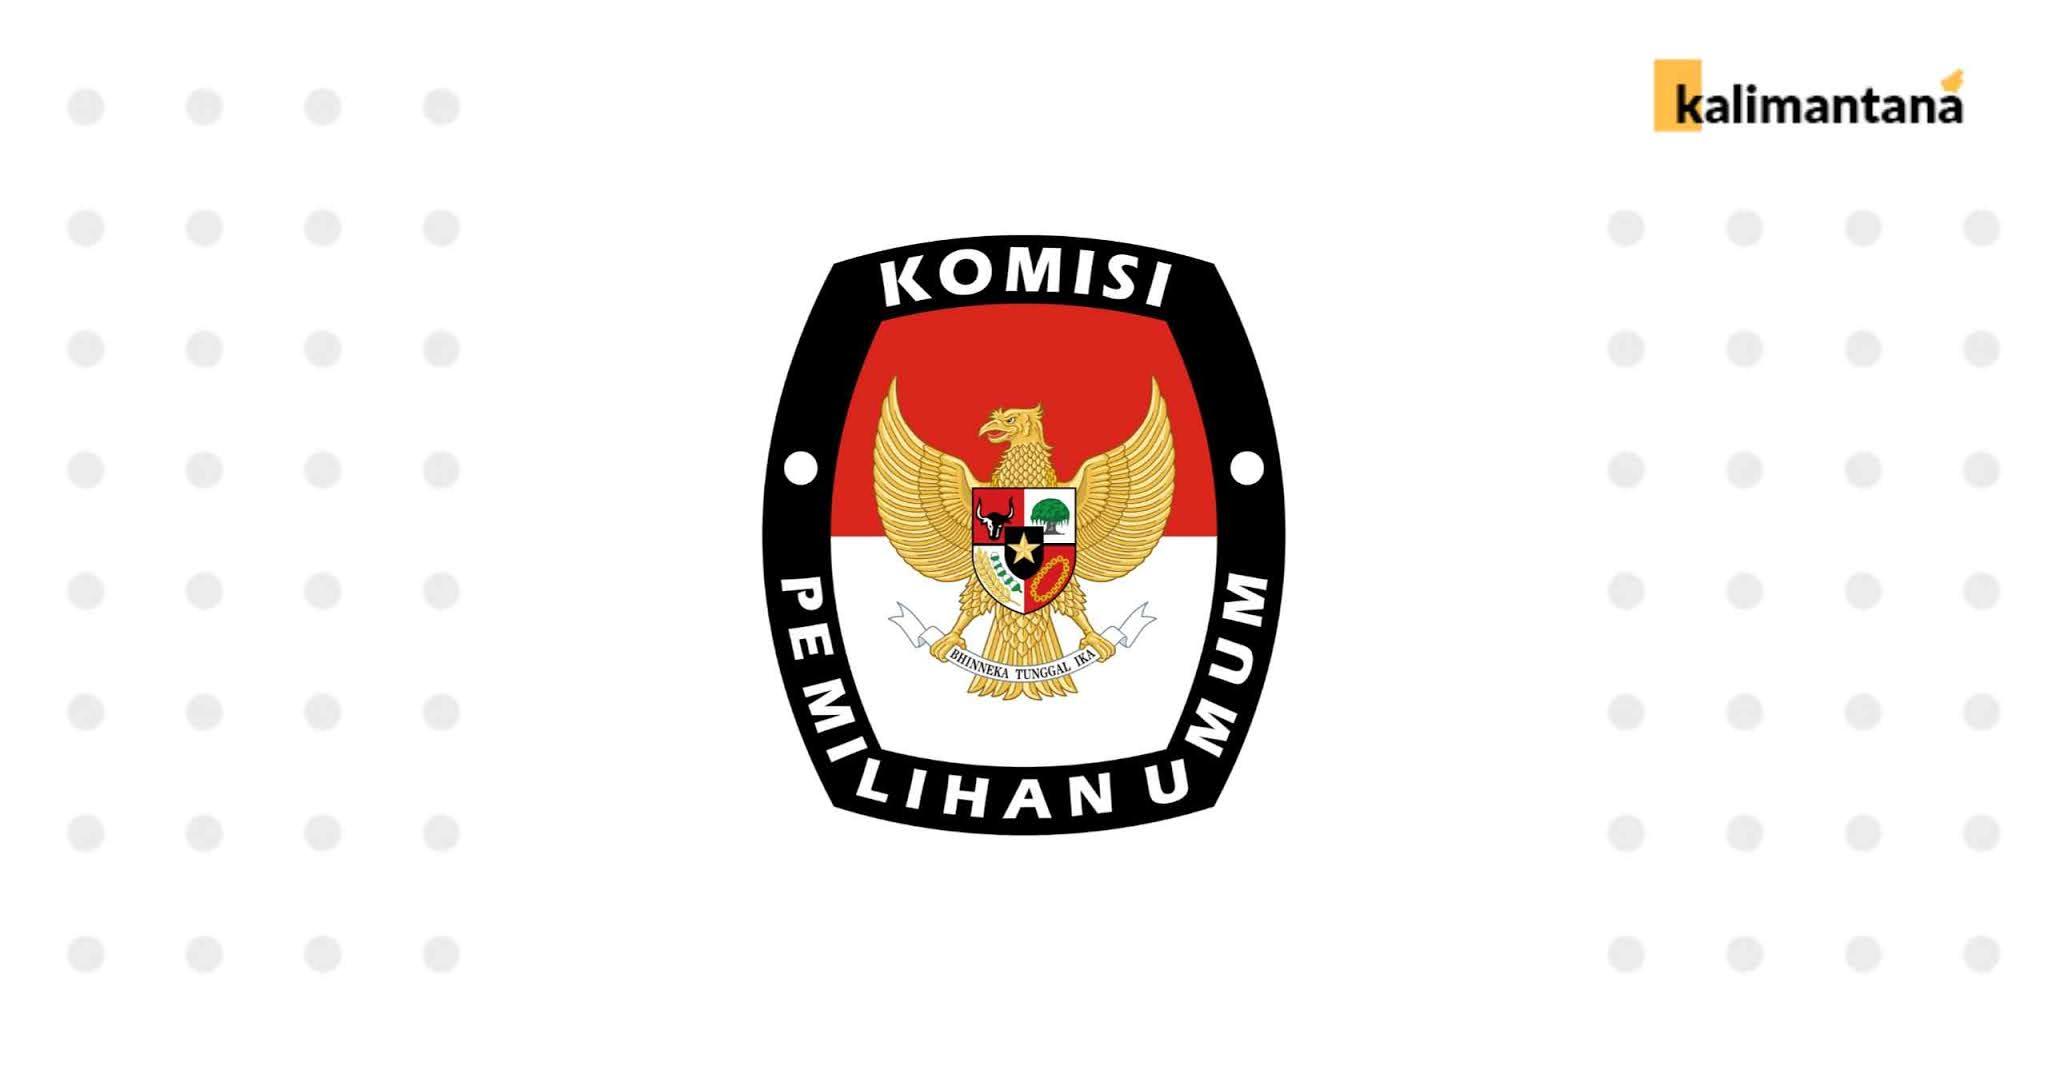 Lowongan Kerja Panitia Pemilu 2020 - KPPS KPU Terbaru